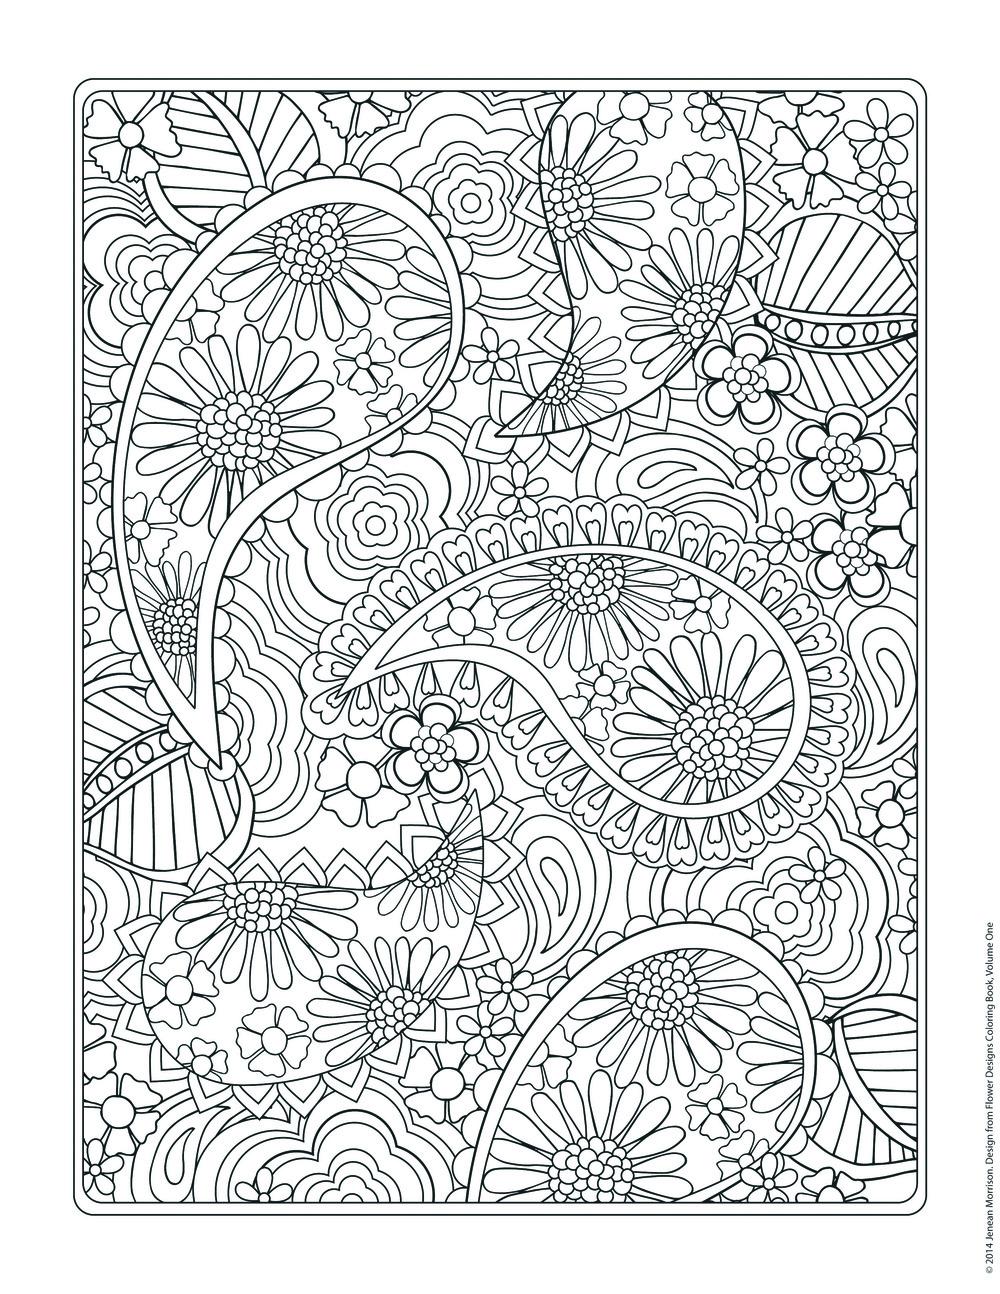 Flower Designs Coloring Book Jenean Morrison Art Design Flower Design Coloring Pages